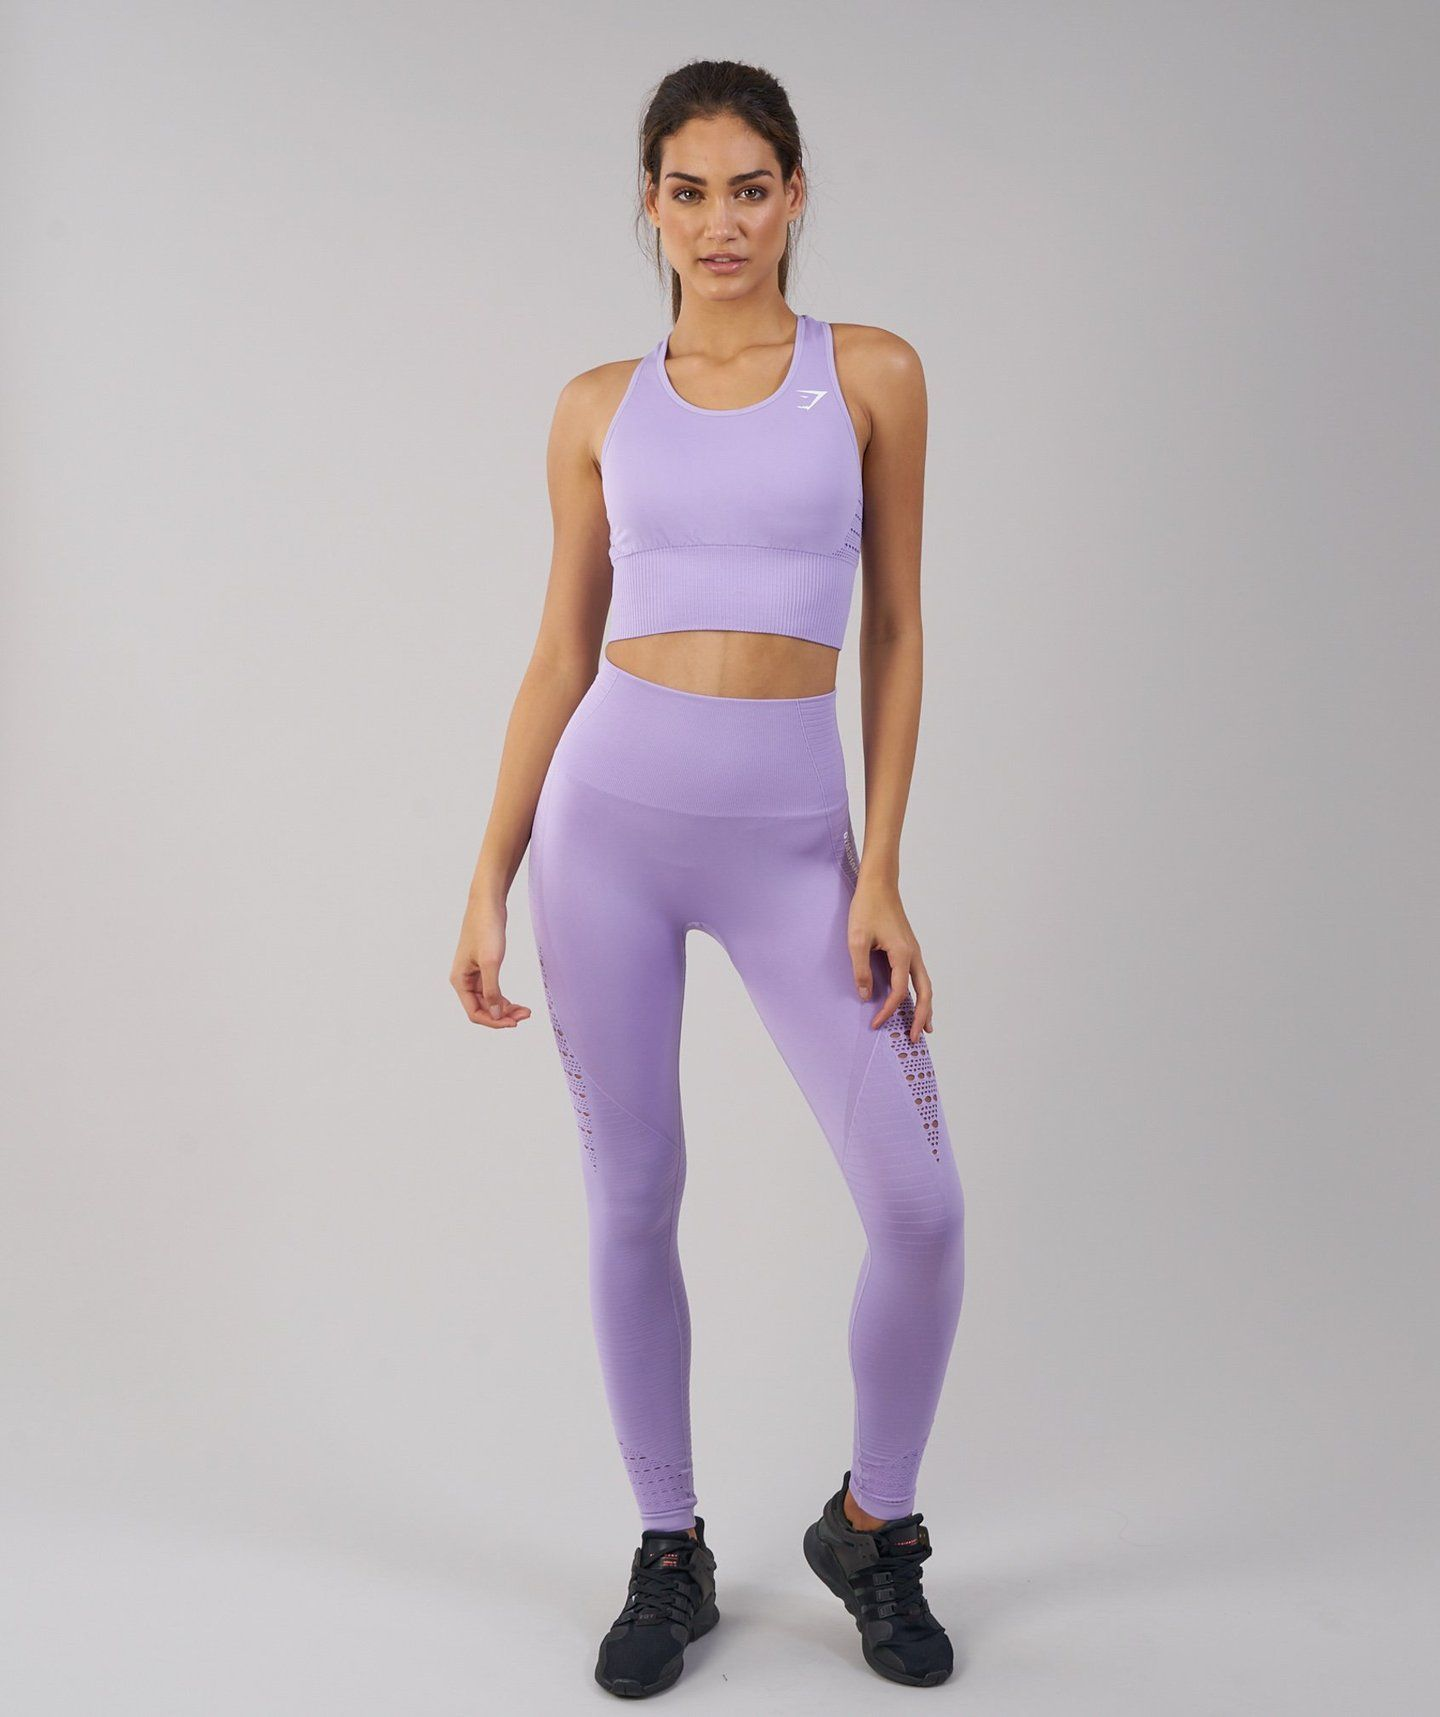 49153f465d762 Gymshark Energy Seamless Crop Top - Pastel Lilac | Workout | Vest ...